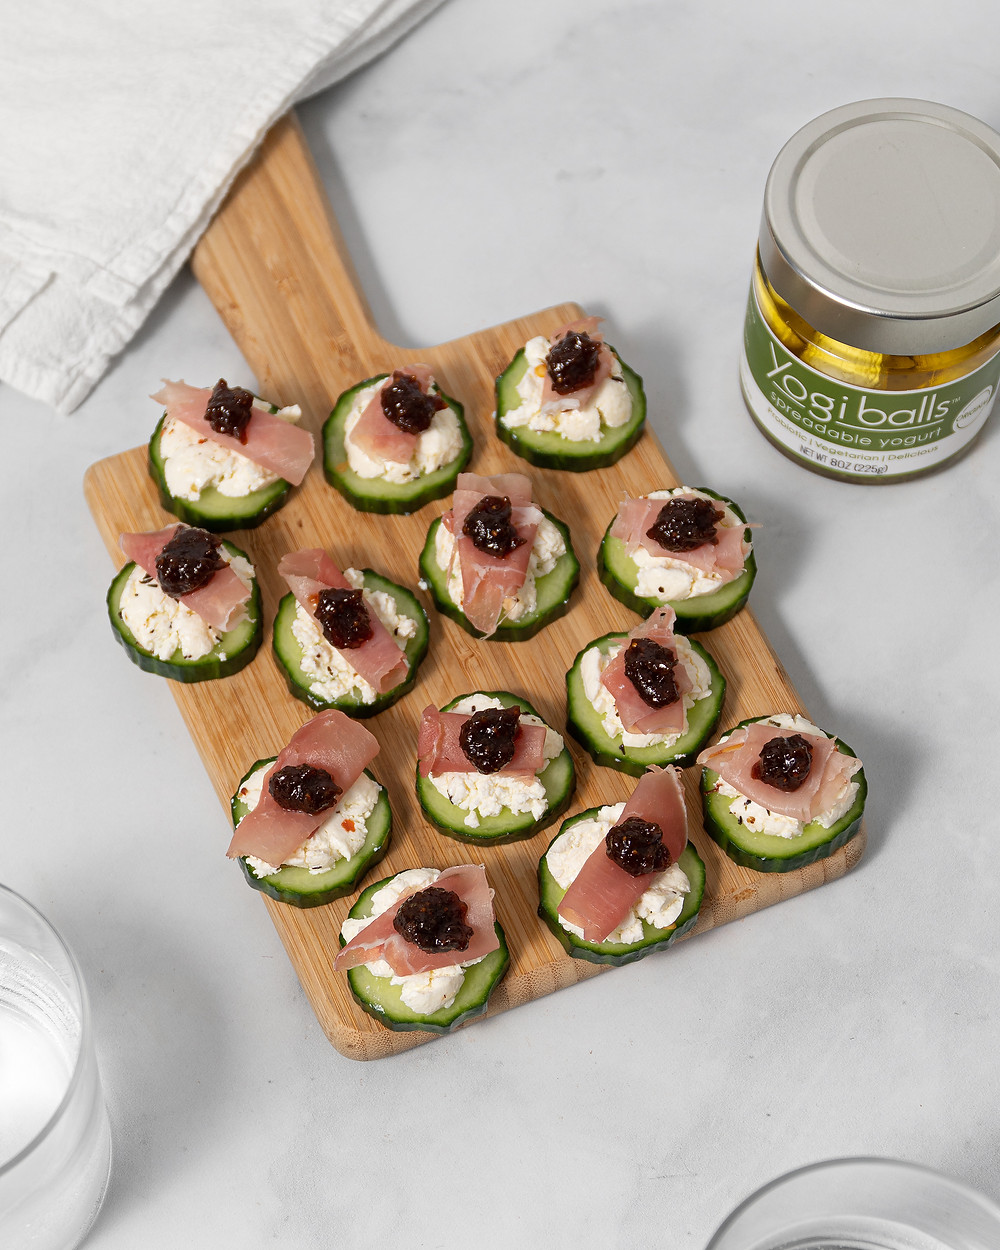 Prosciutto & YogiBalls Cucumber Appetizer